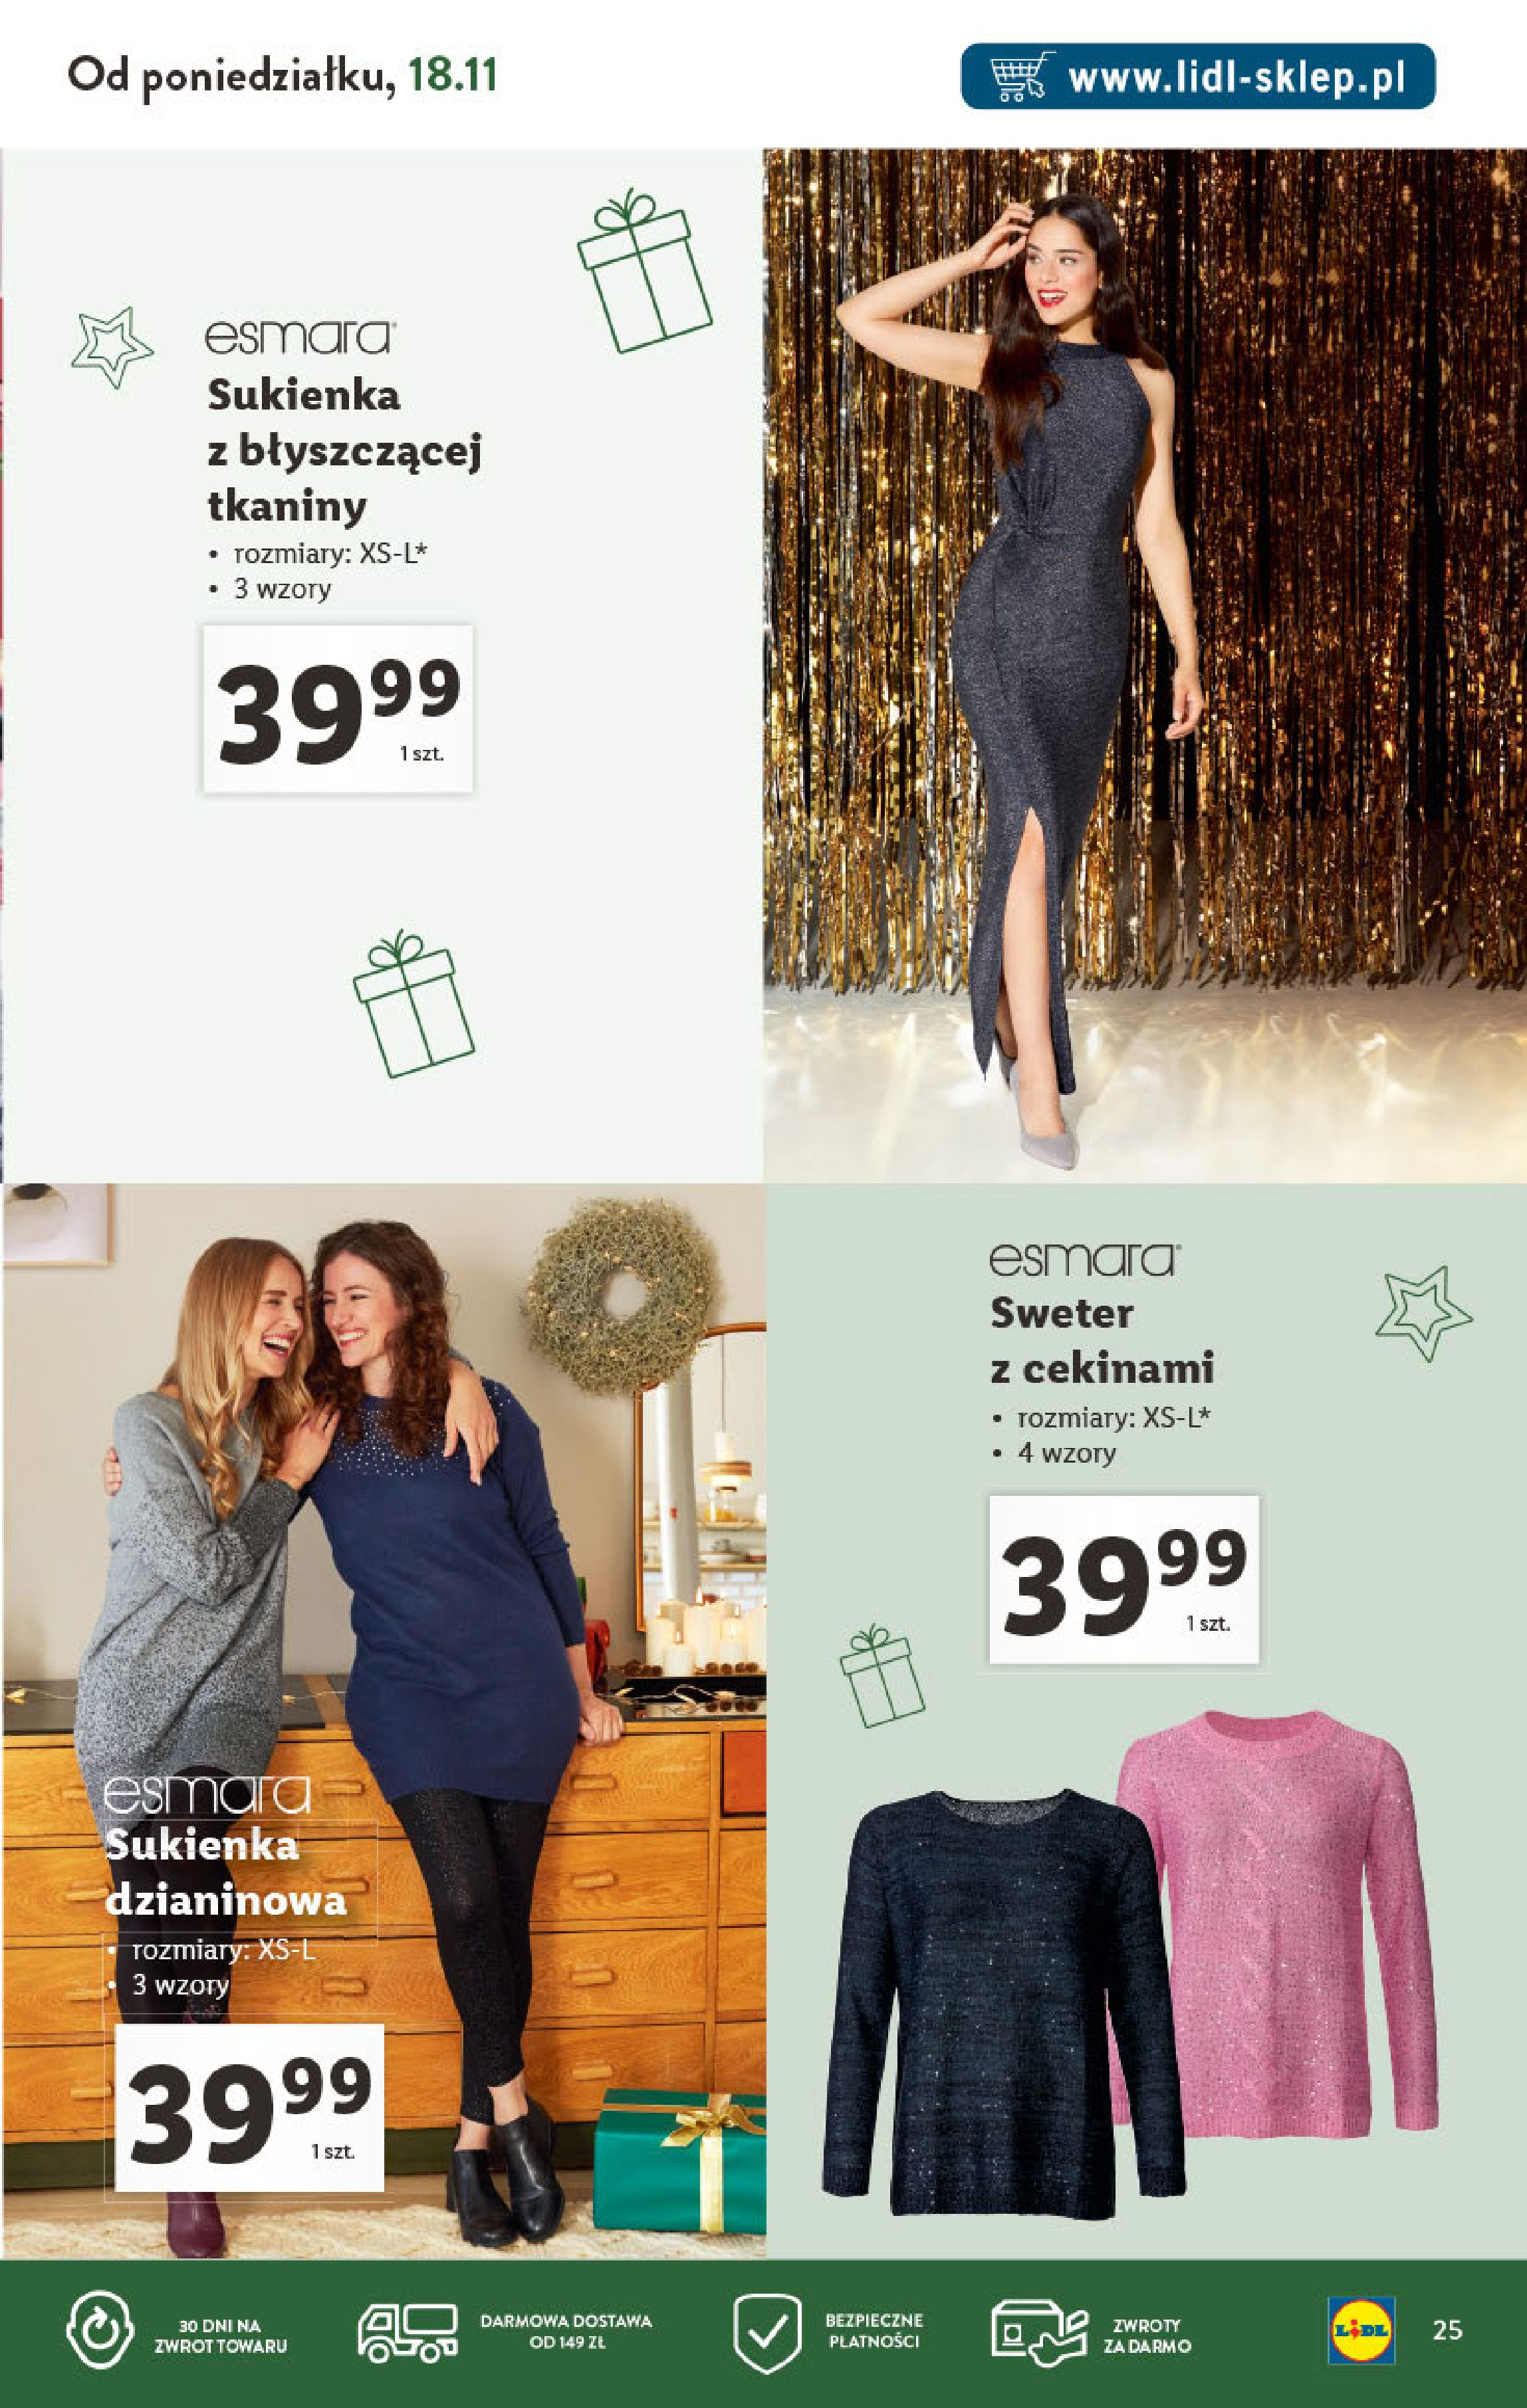 Gazetka Lidl - Katalog Online-13.10.2019-02.12.2019-page-25